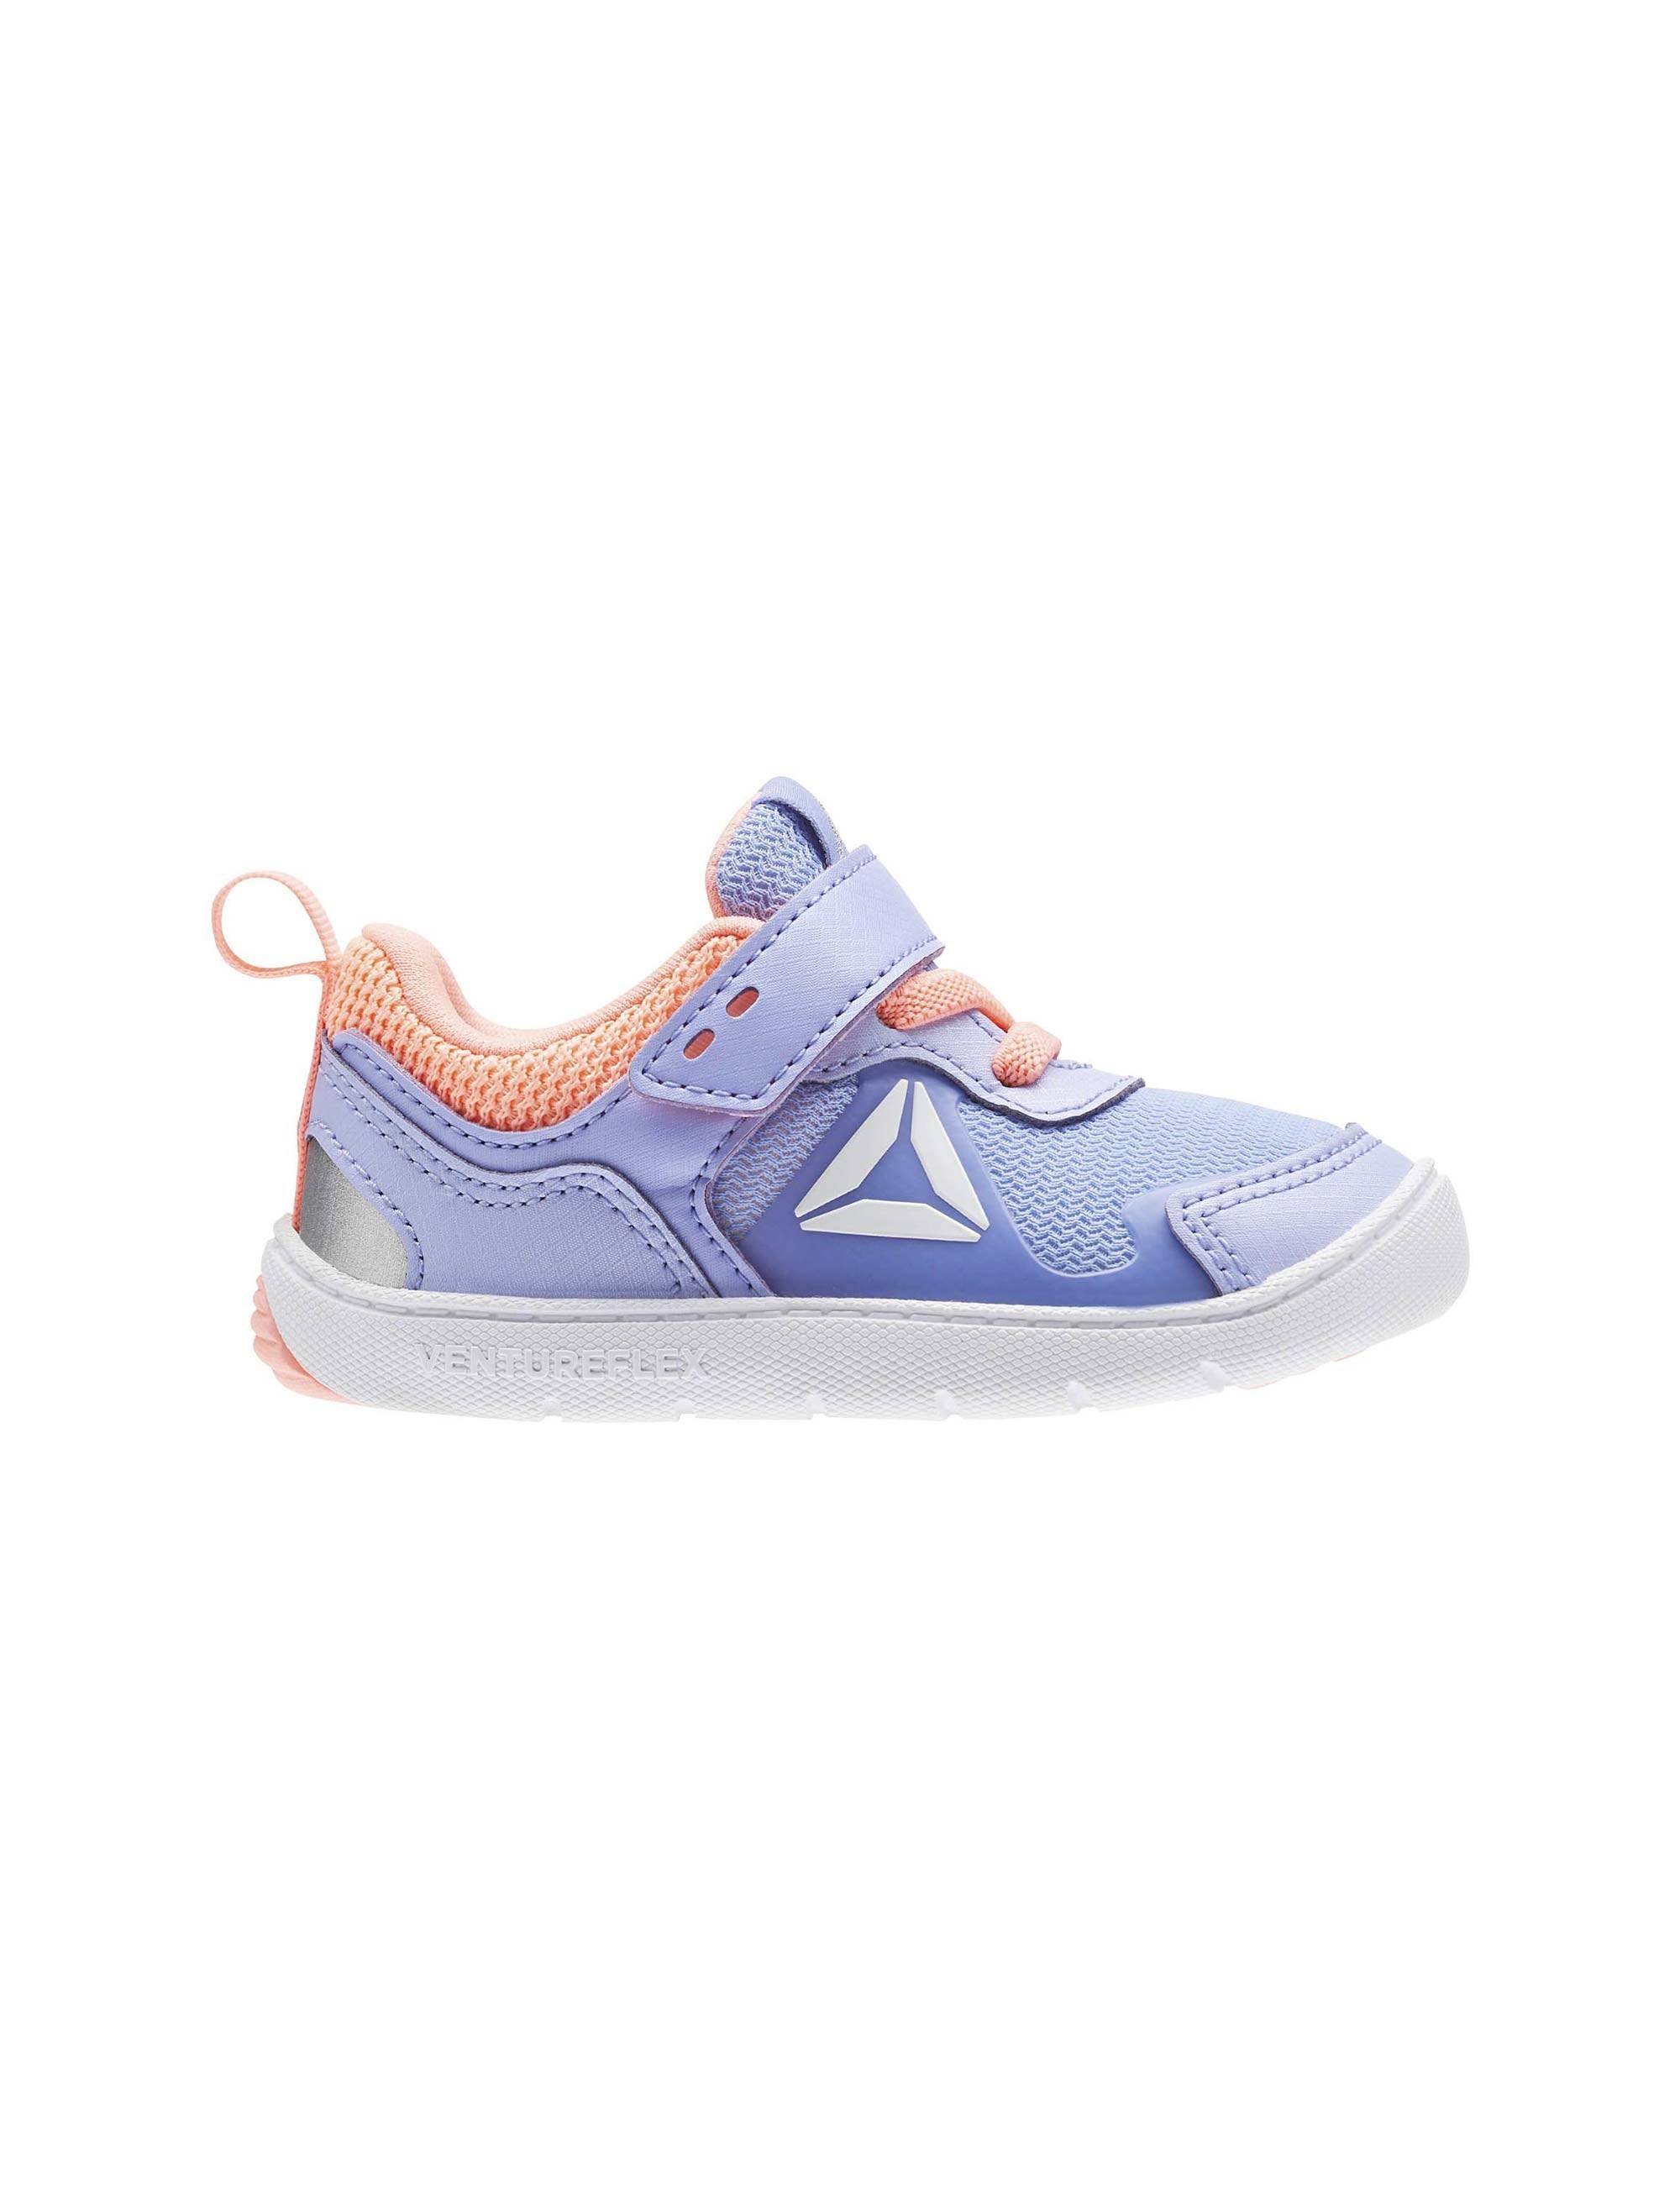 کفش دویدن چسبی نوزادی Ventureflex Stride 5-0 - ریباک - ياسي - 1